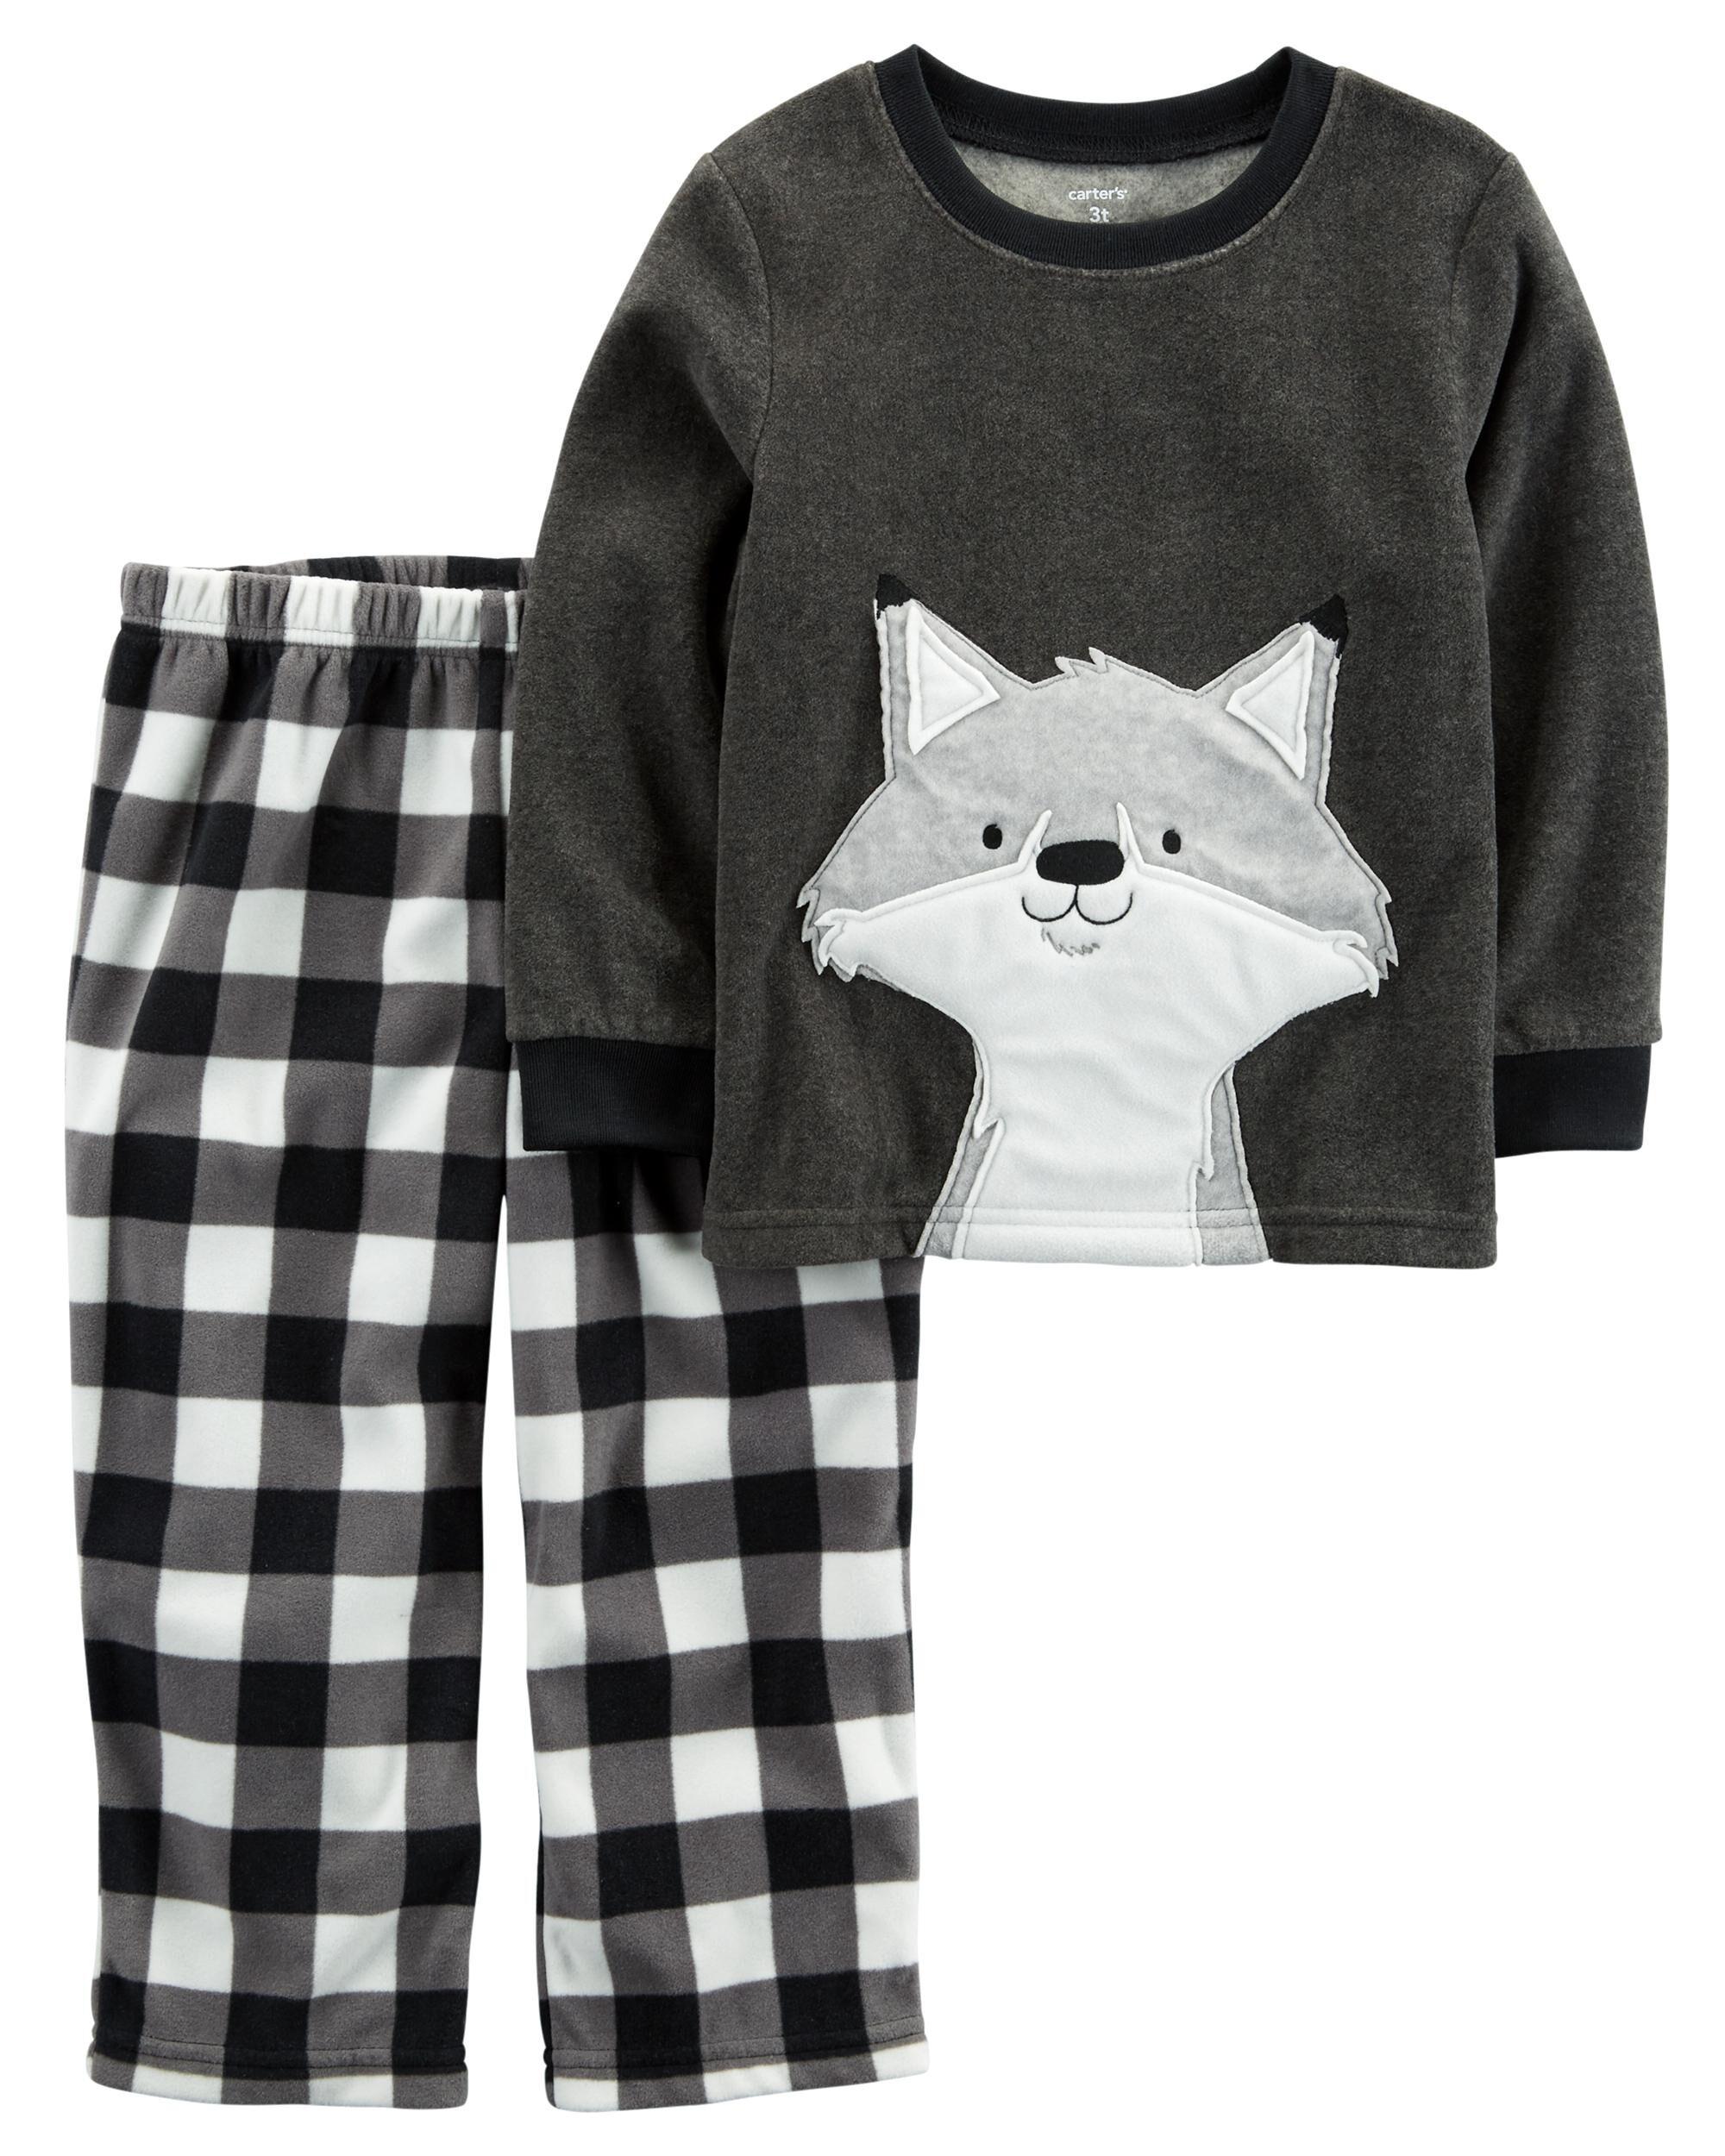 8c14f6fdb6d8 2-Piece Fox Fleece PJs